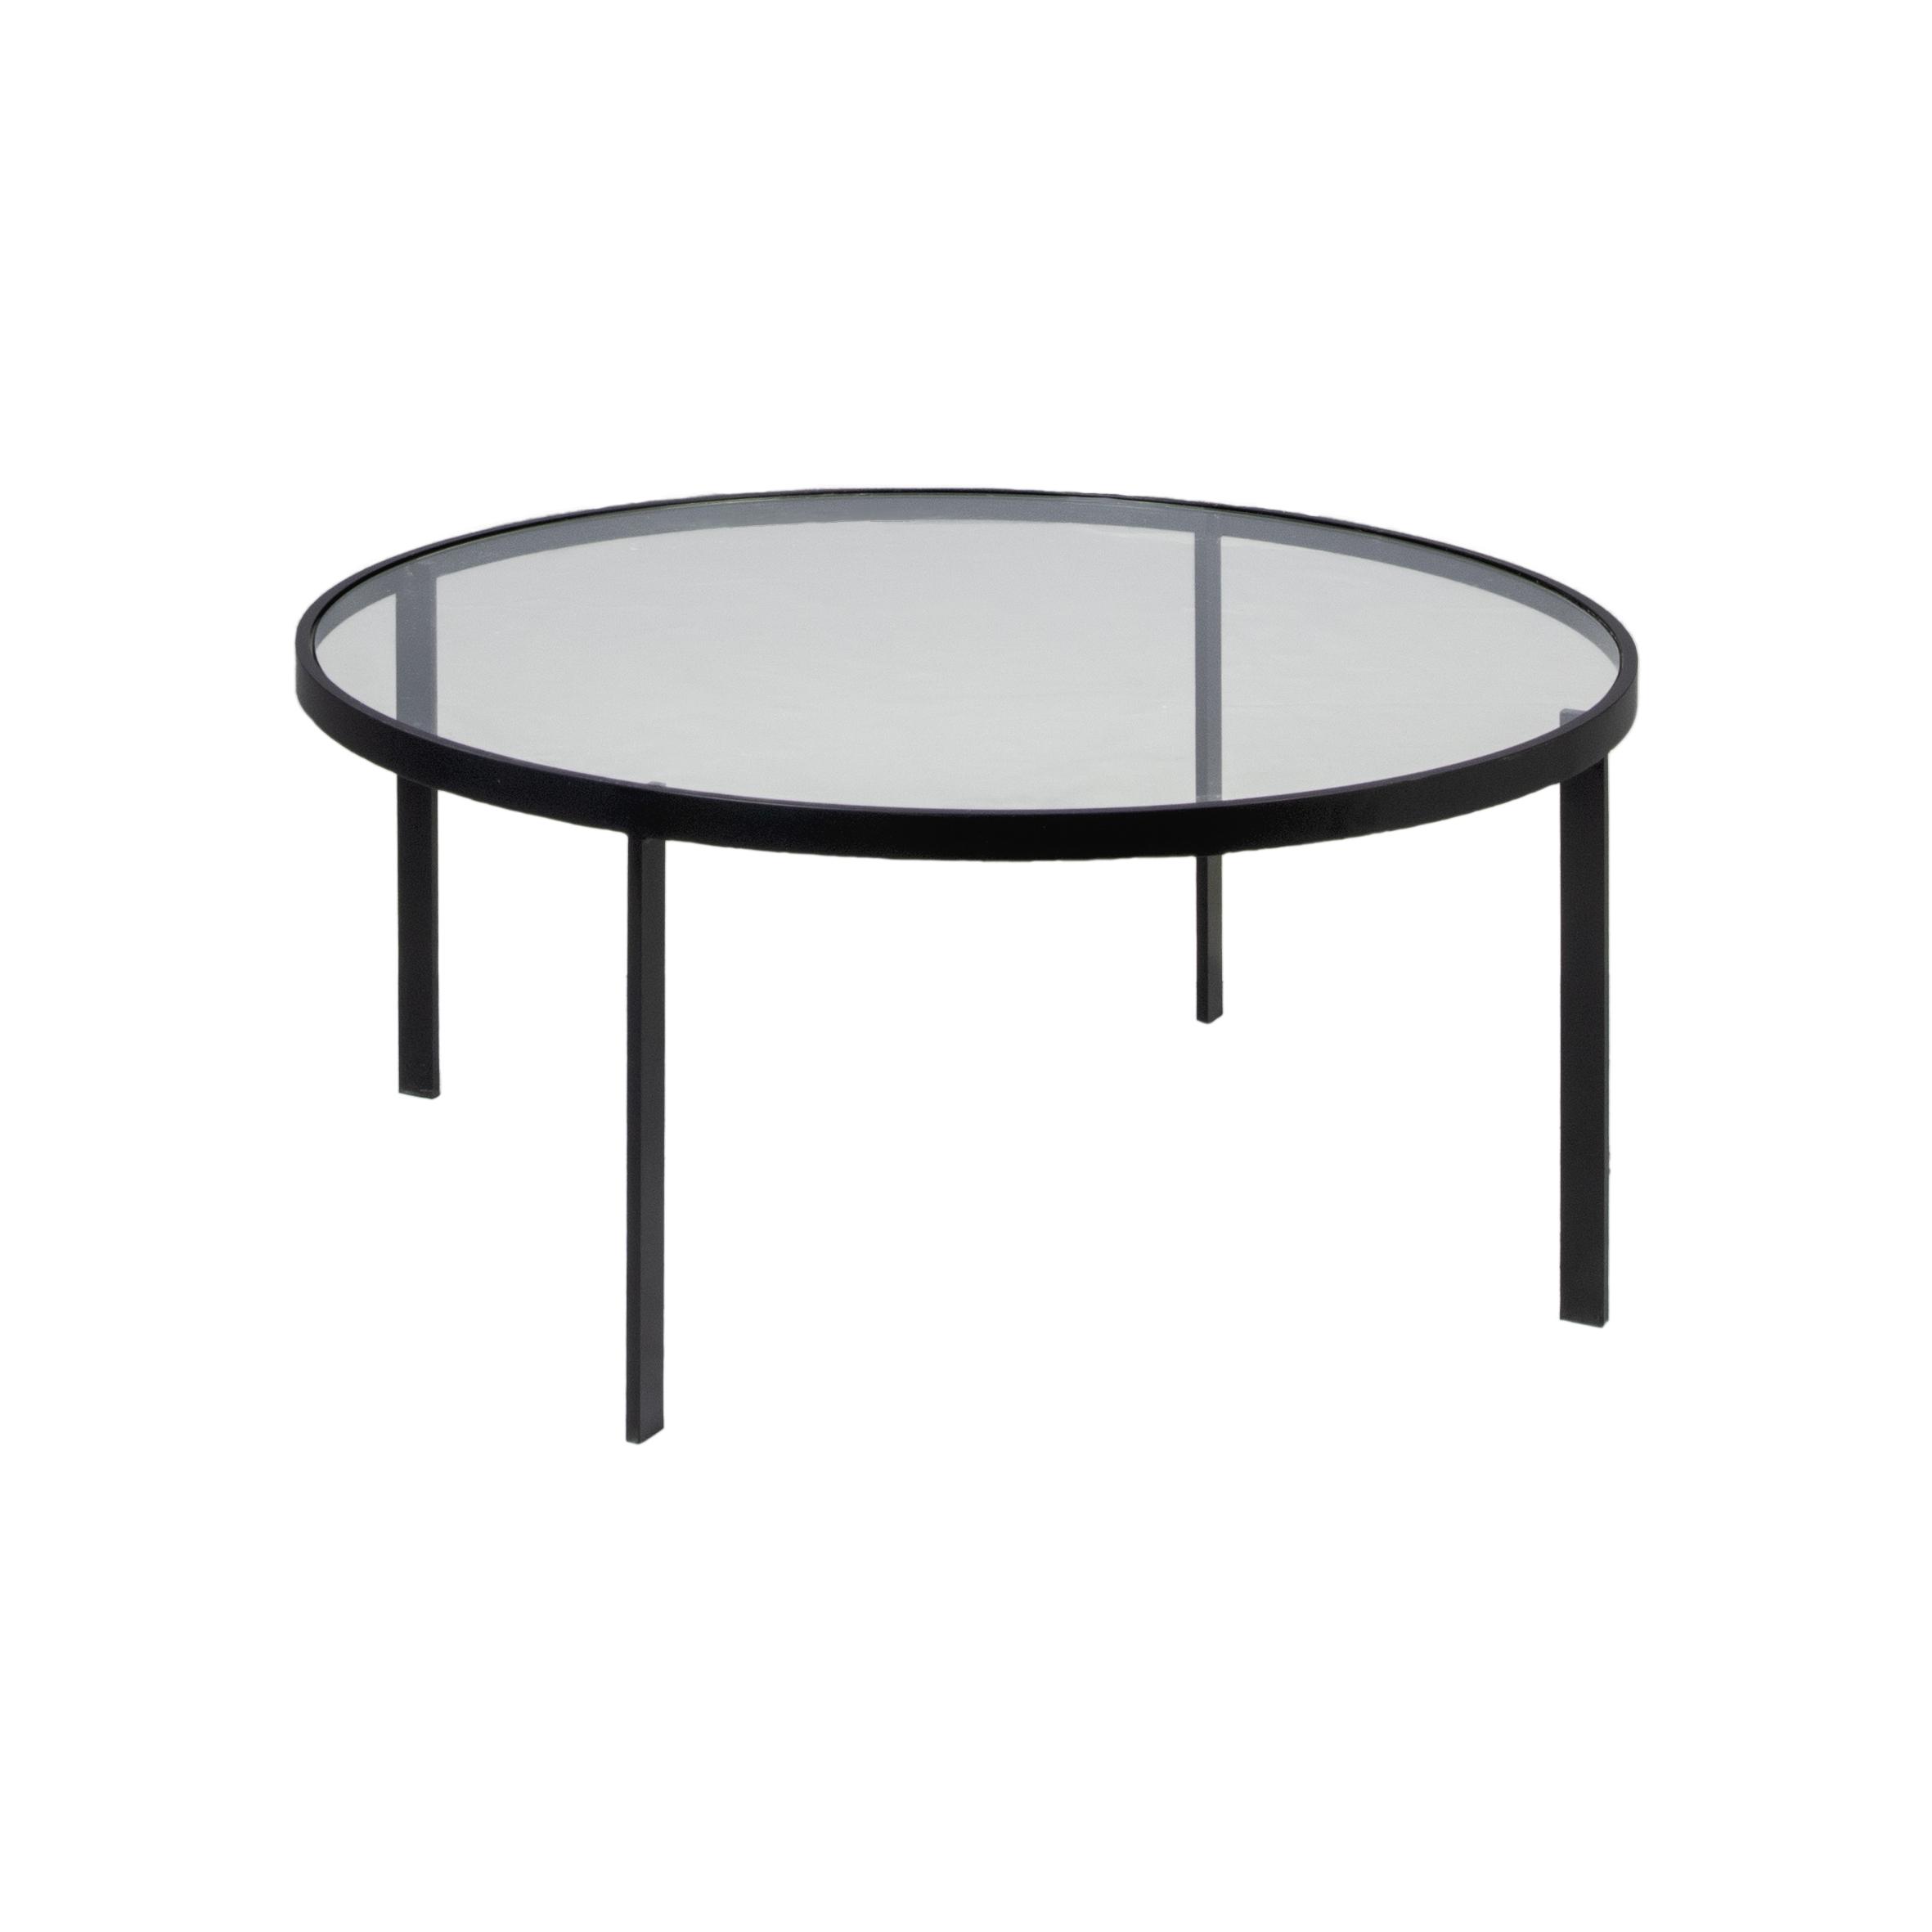 Square Soffbord med glasskiva - englesson.se